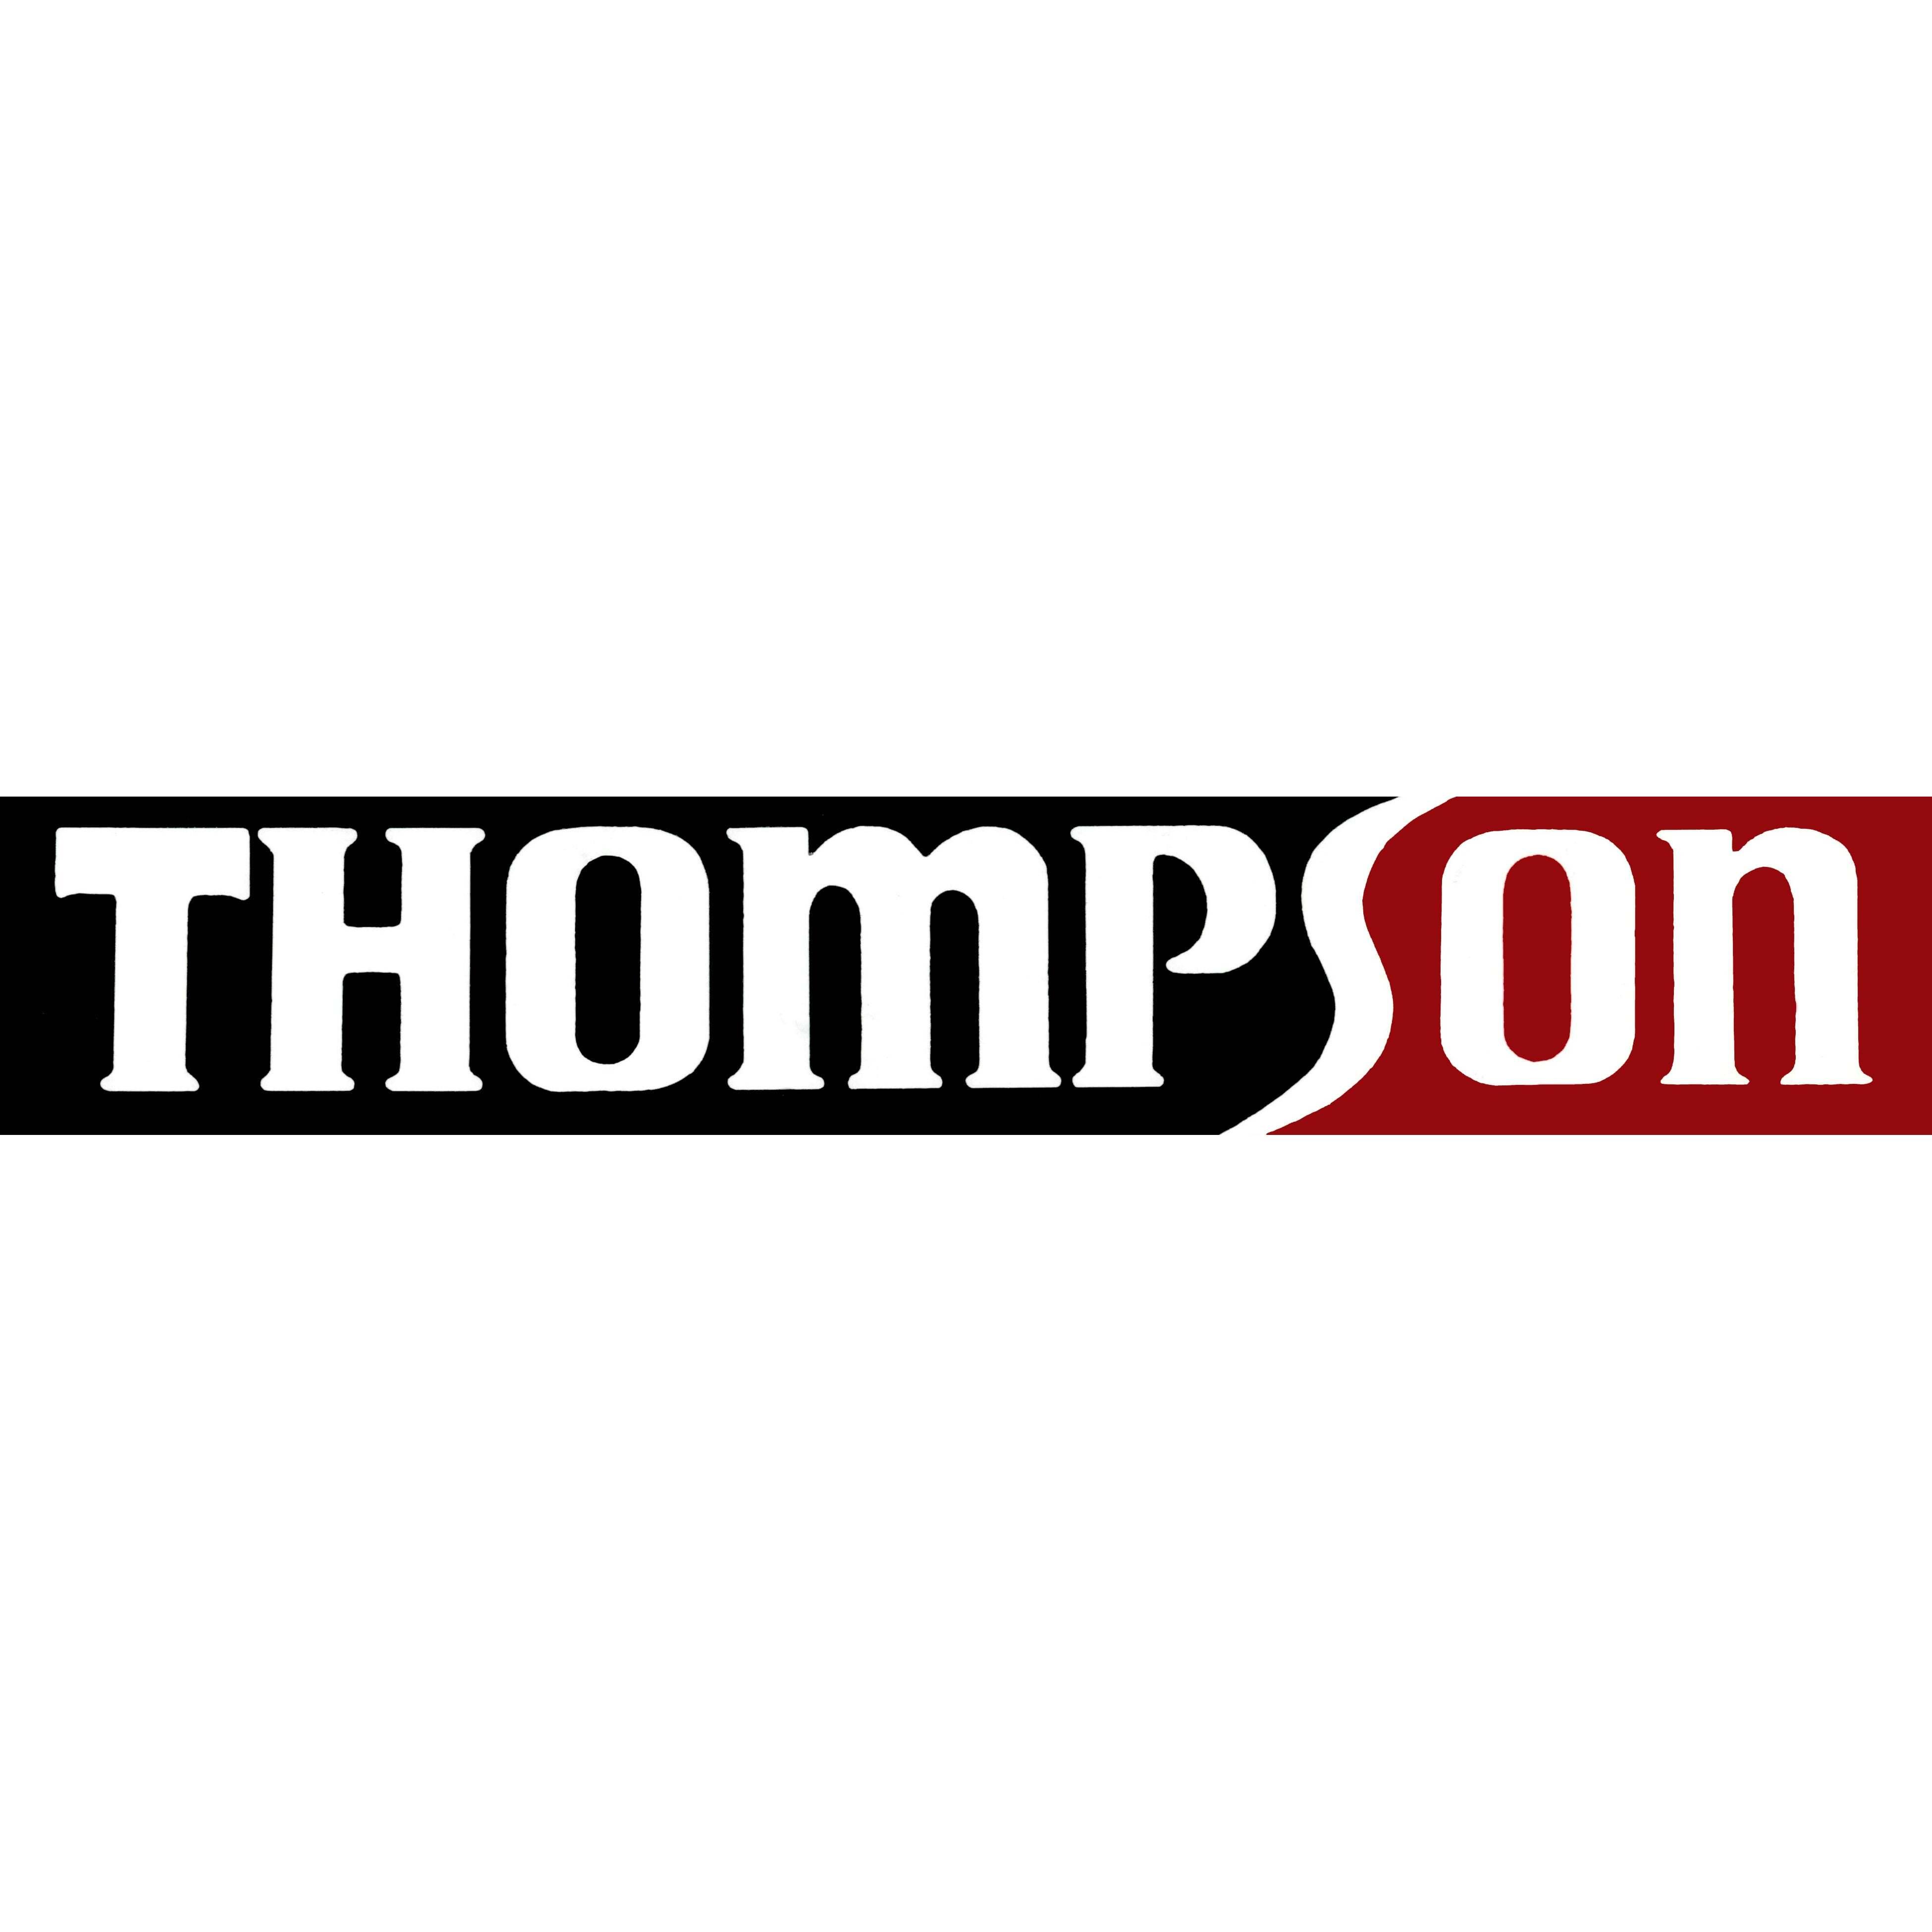 Thompson Overhead Door Co. Inc. image 0